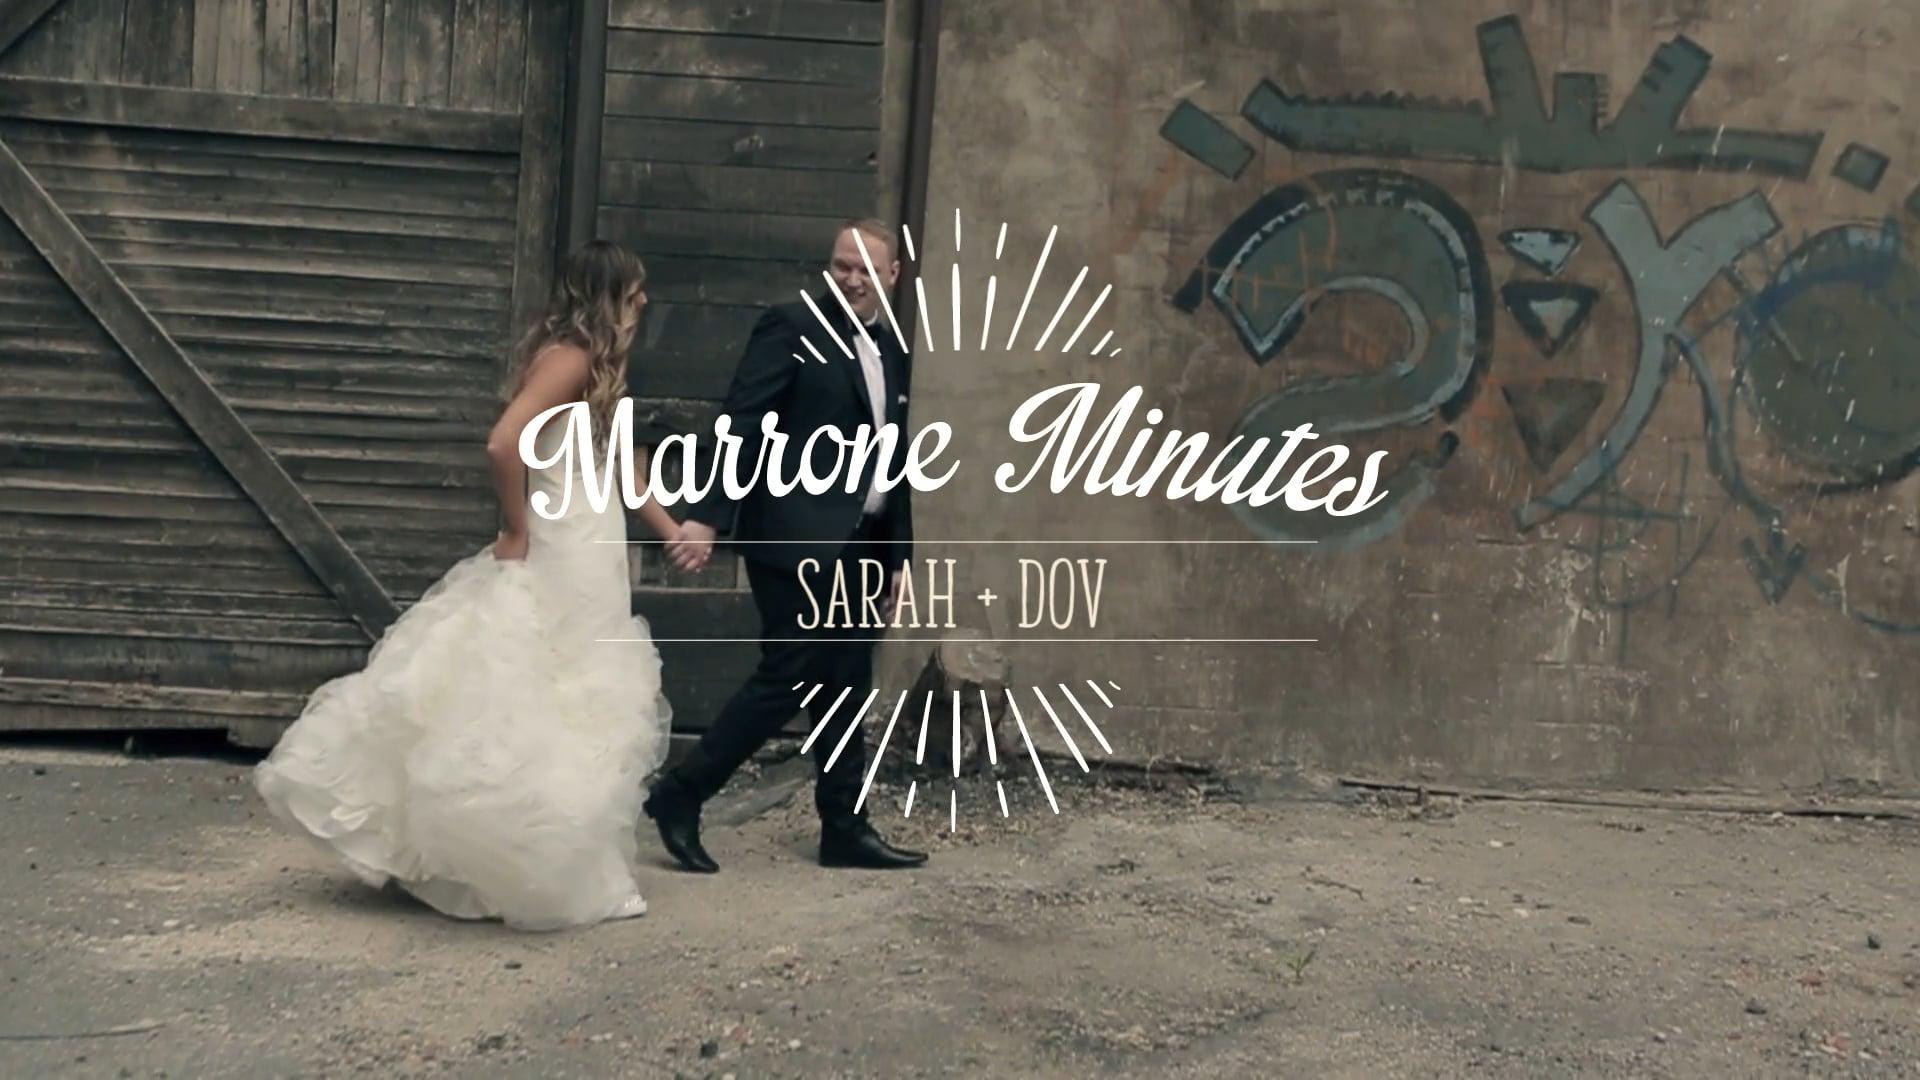 Sarah & Dov ~ Marrone Minutes